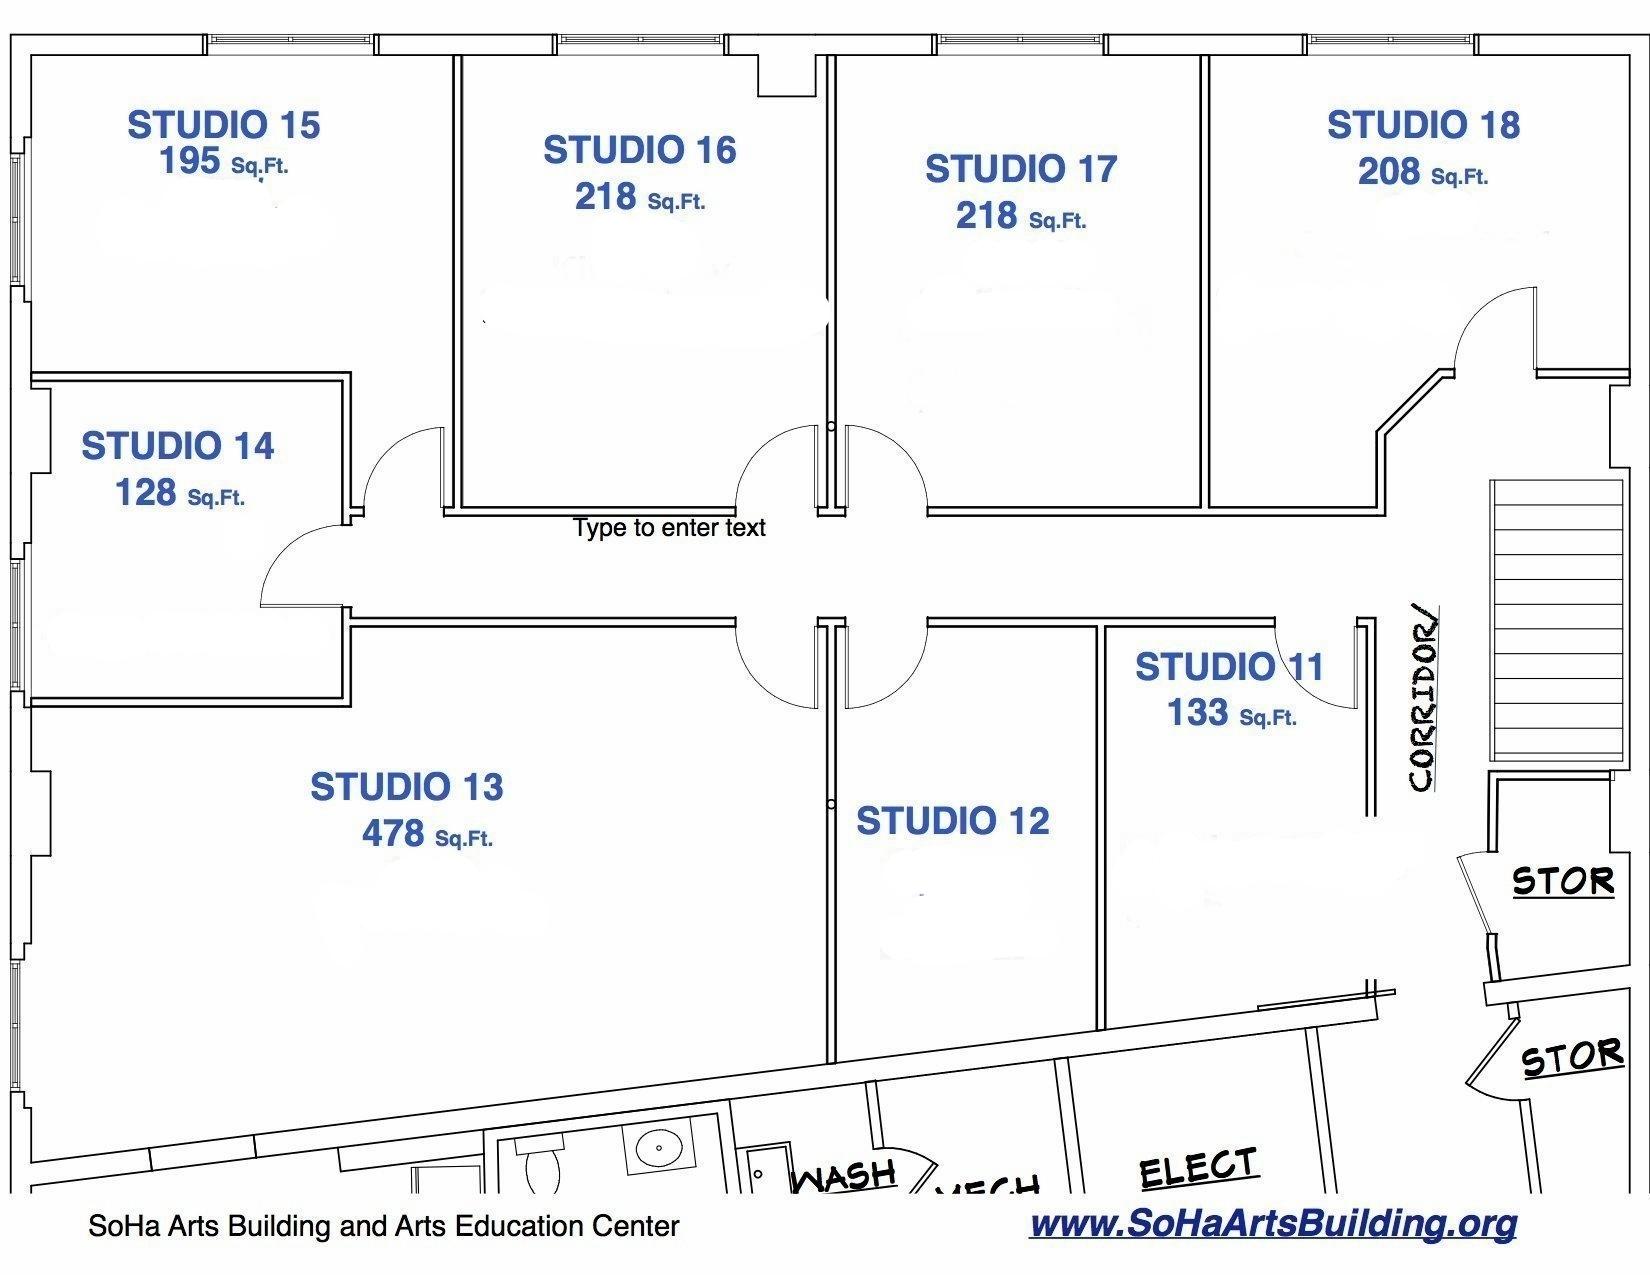 SOHA_STUDIOS_FLOORPLAN_11-18 updated 10-28-2017.jpg